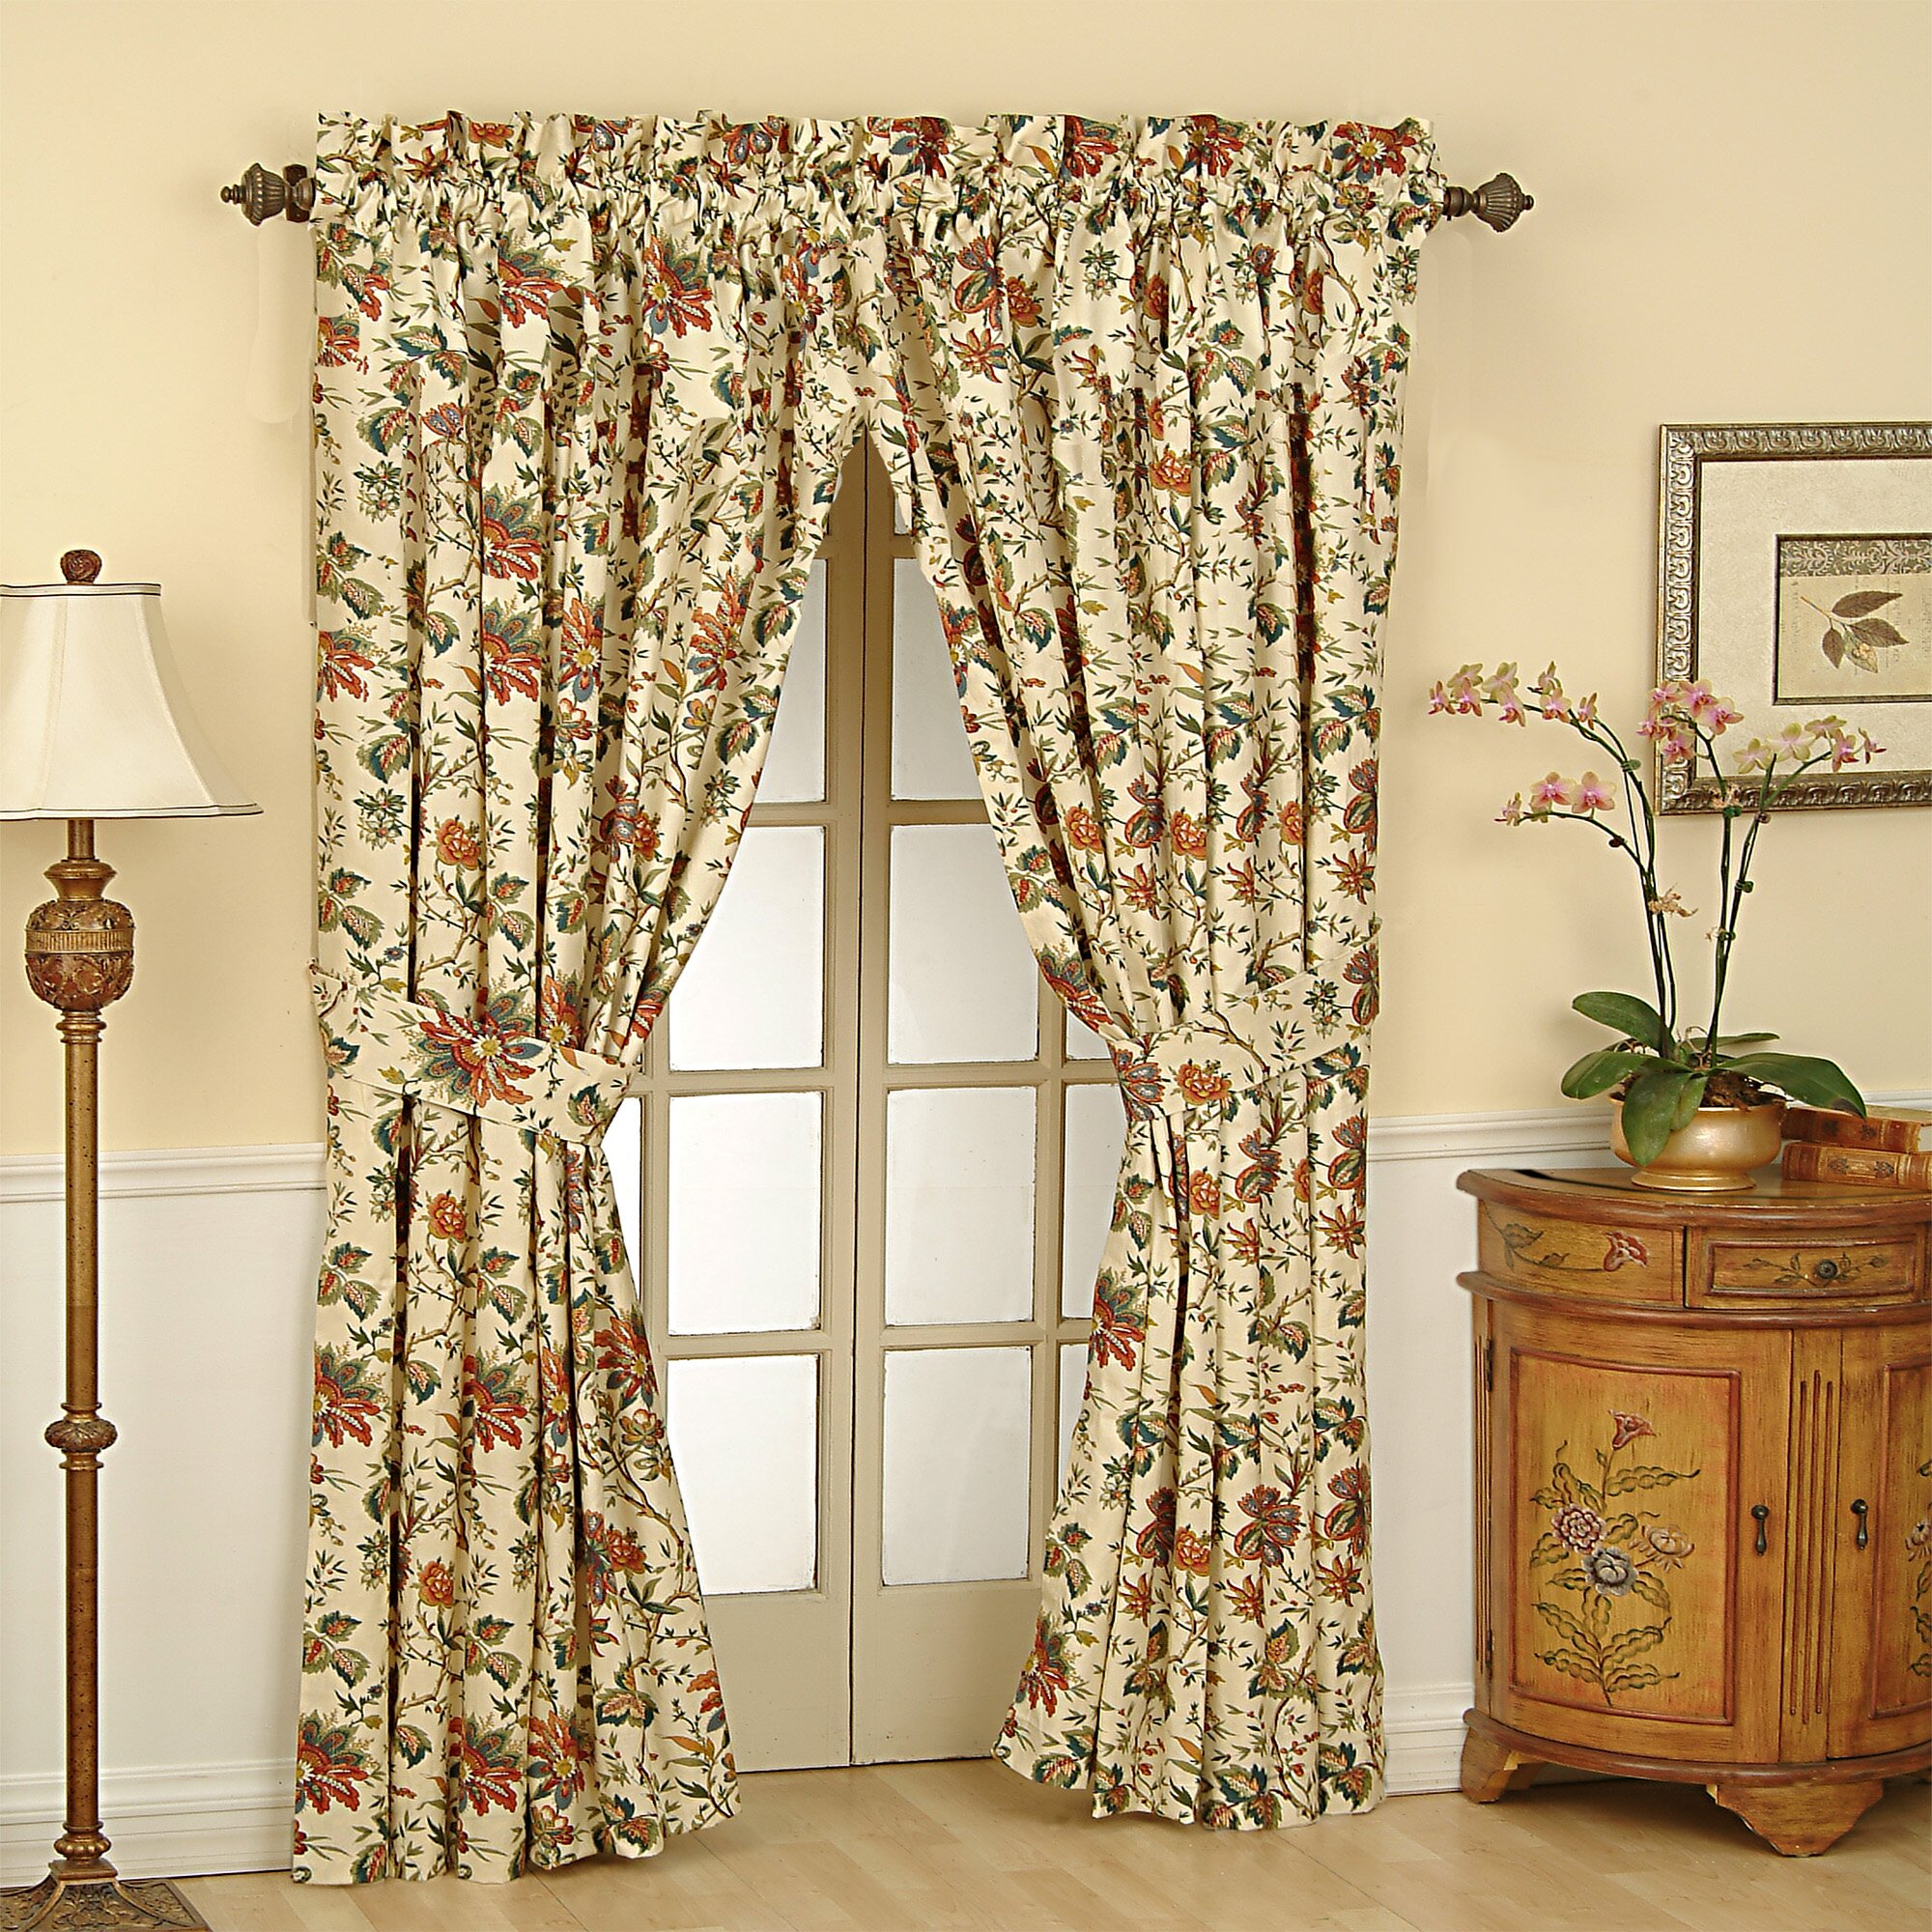 Waverly kitchen curtains - Waverly Felicite Rod Pocket Window Single Curtain Panel